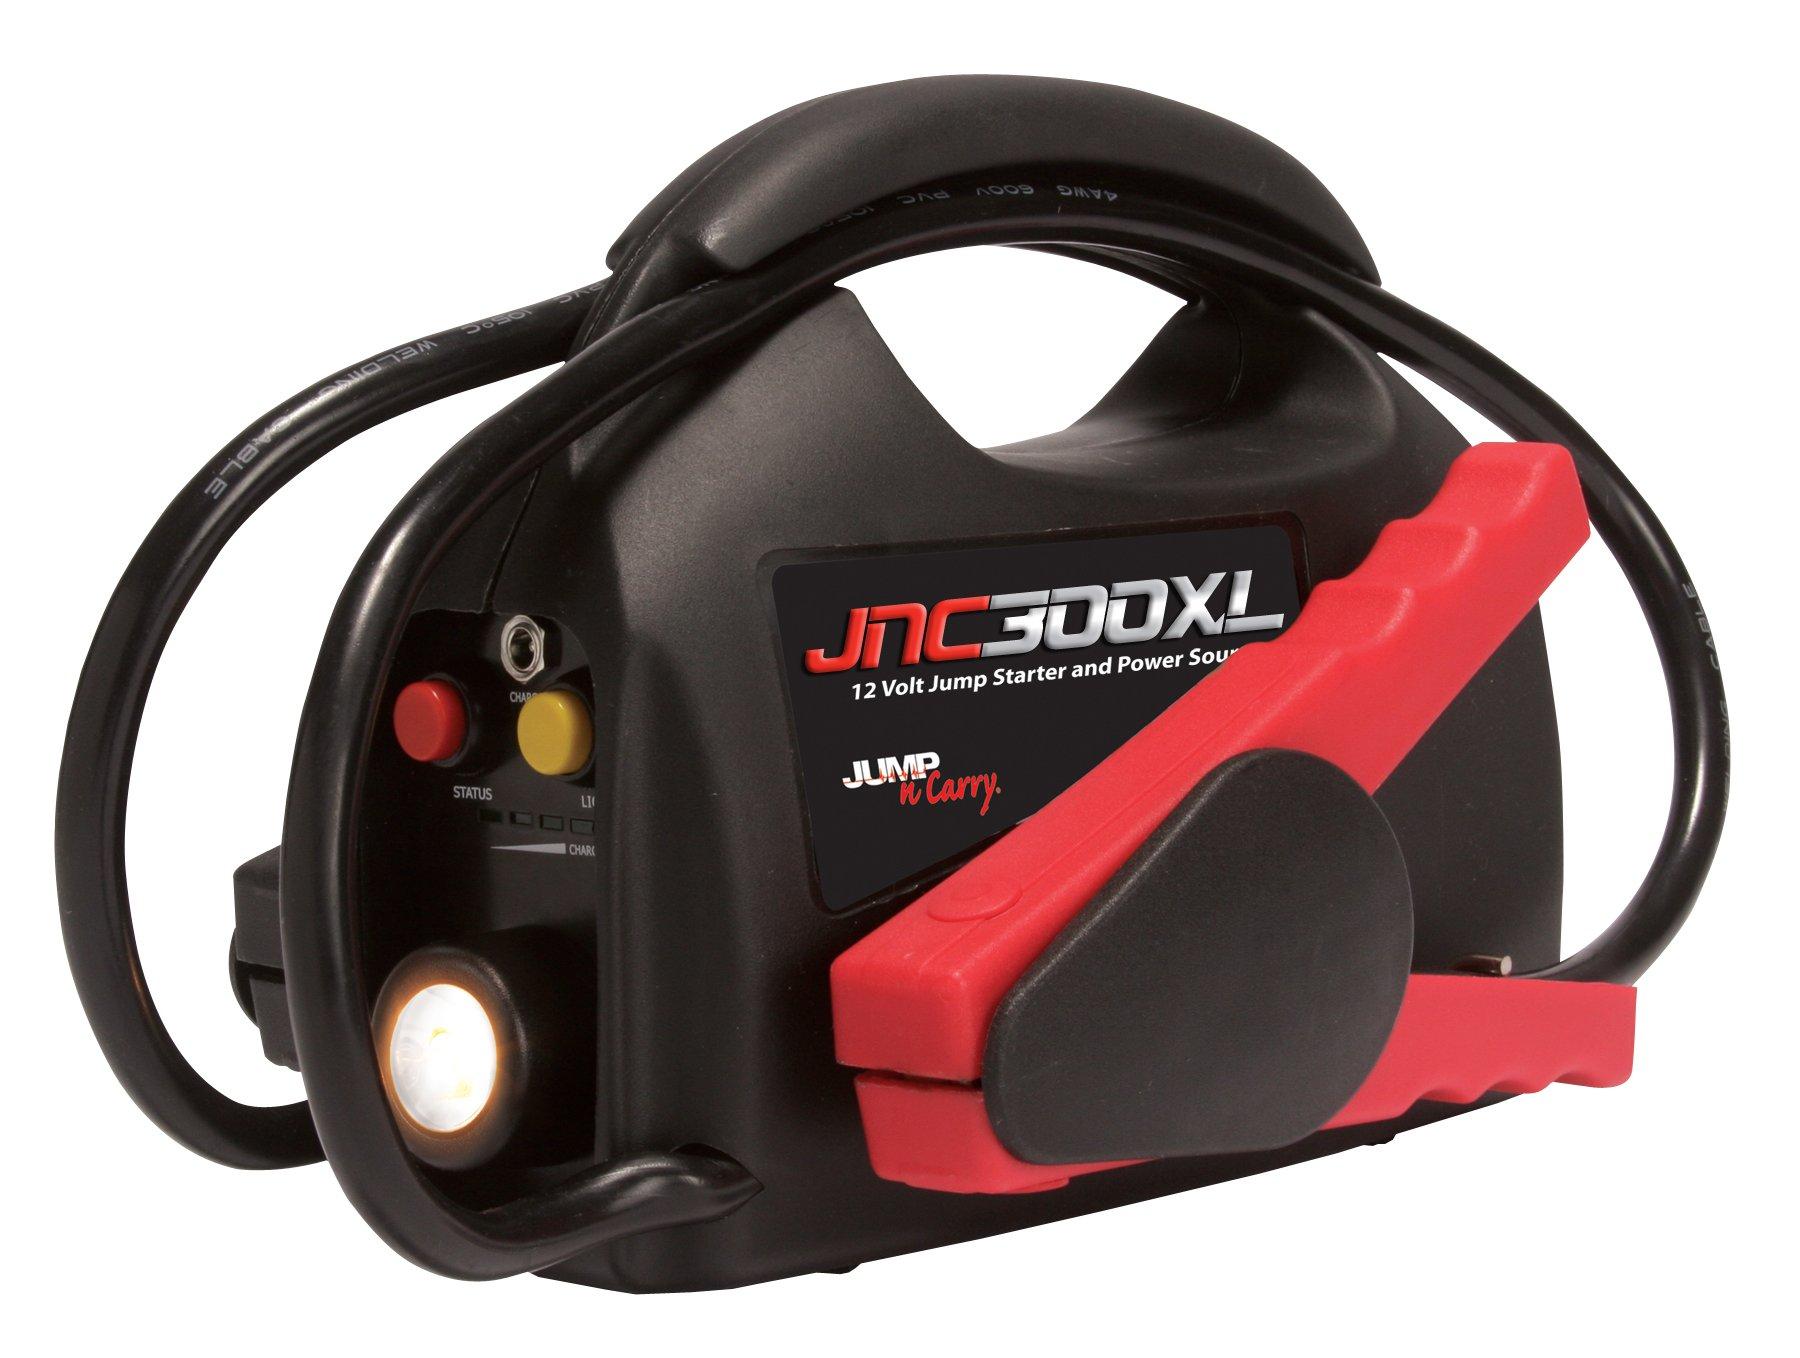 Clore Automotive Jump-N-Carry JNC300XL 900 Peak Amp Jump Starter by Clore Automotive